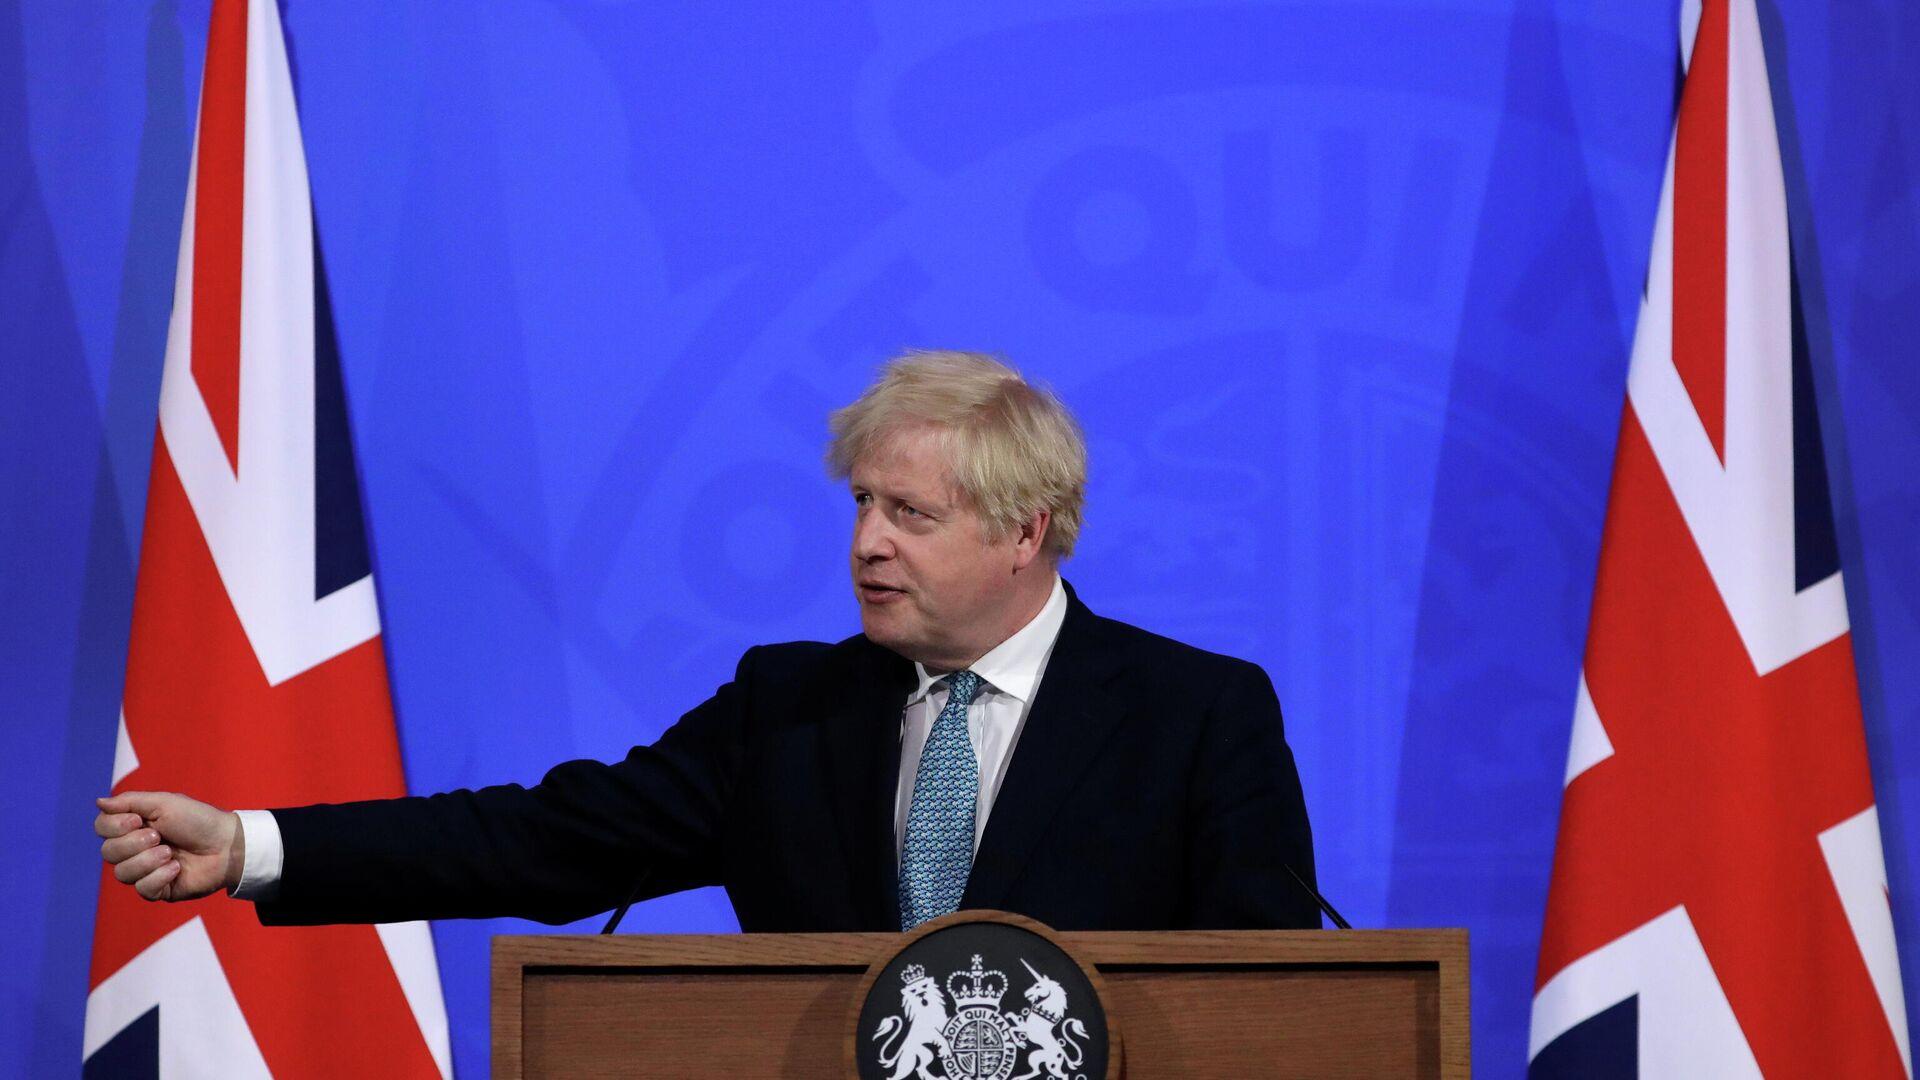 Boris Johnson, primer ministro del Reino Unido - Sputnik Mundo, 1920, 21.05.2021